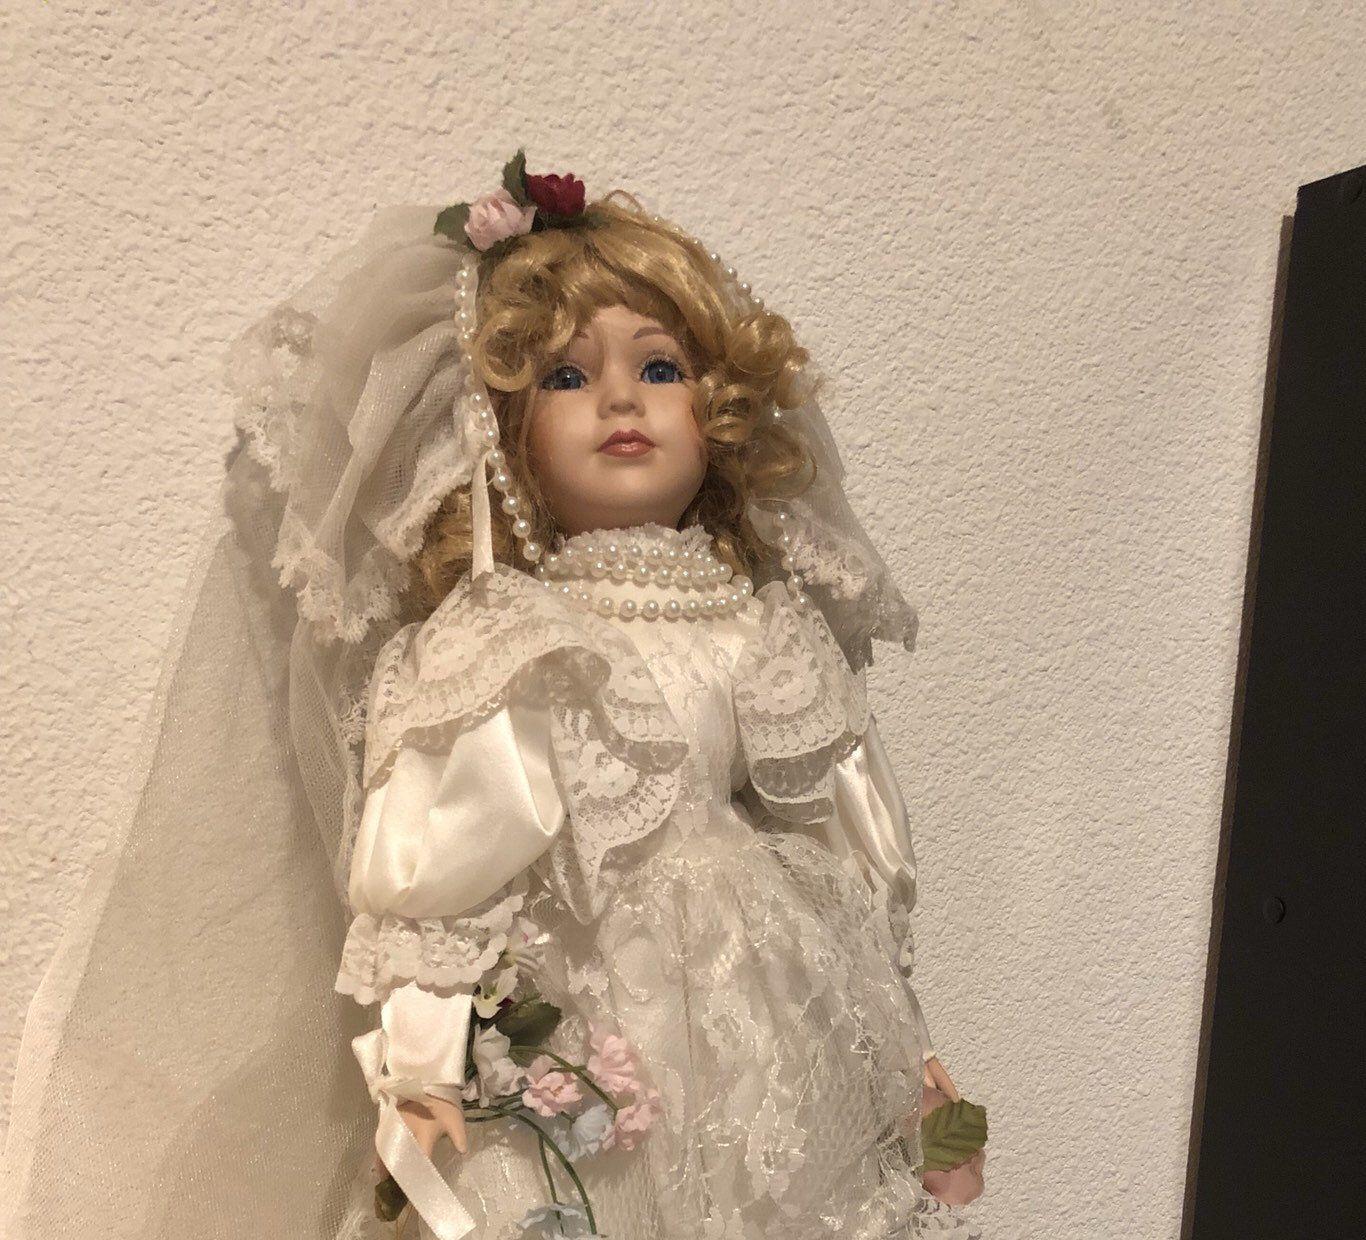 18 inch Porcelain Bride Dolls Collection #bridedolls